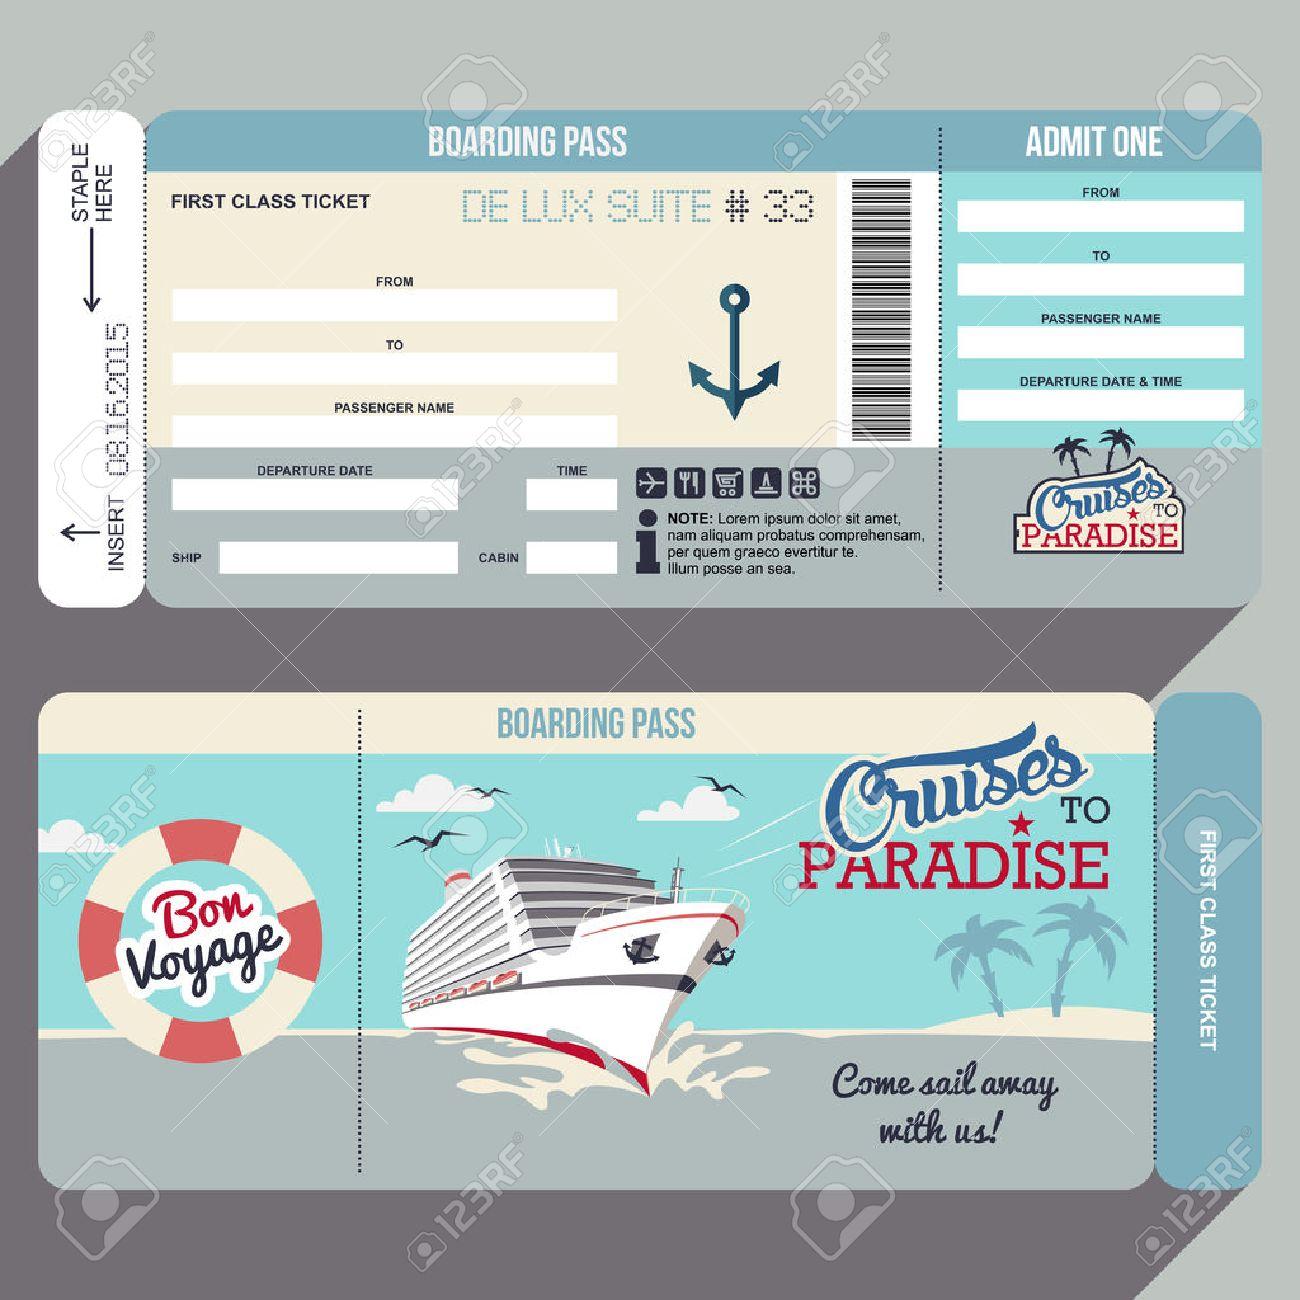 Cruises To Paradise. Cruise Ship Boarding Pass Flat Graphic Design ...